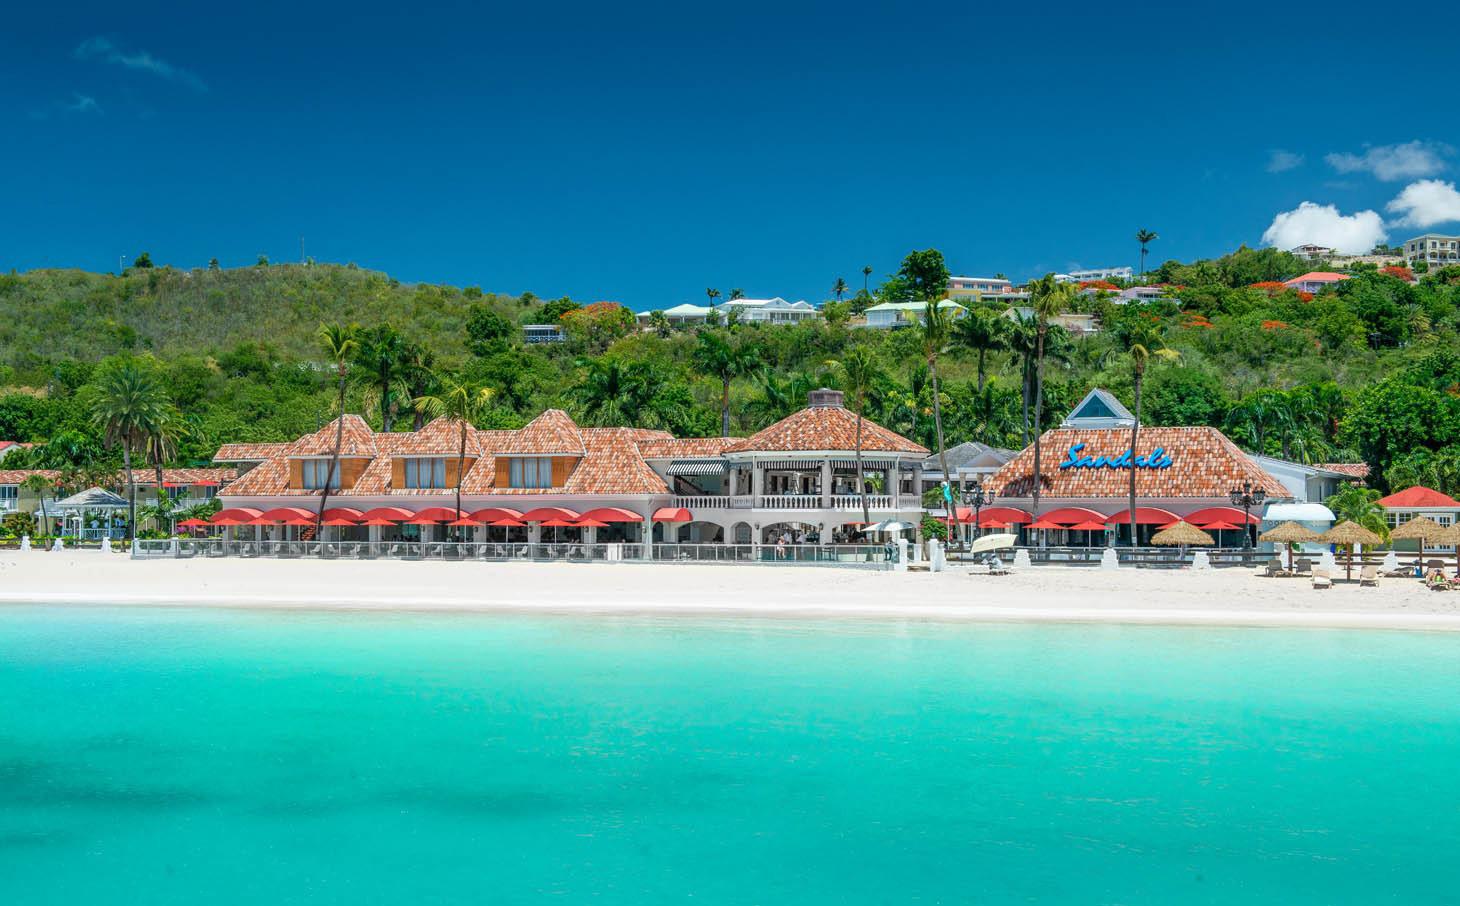 news-main-sandals-resorts-begins-caribbean-reopening-in-antigua.1591616095.jpg